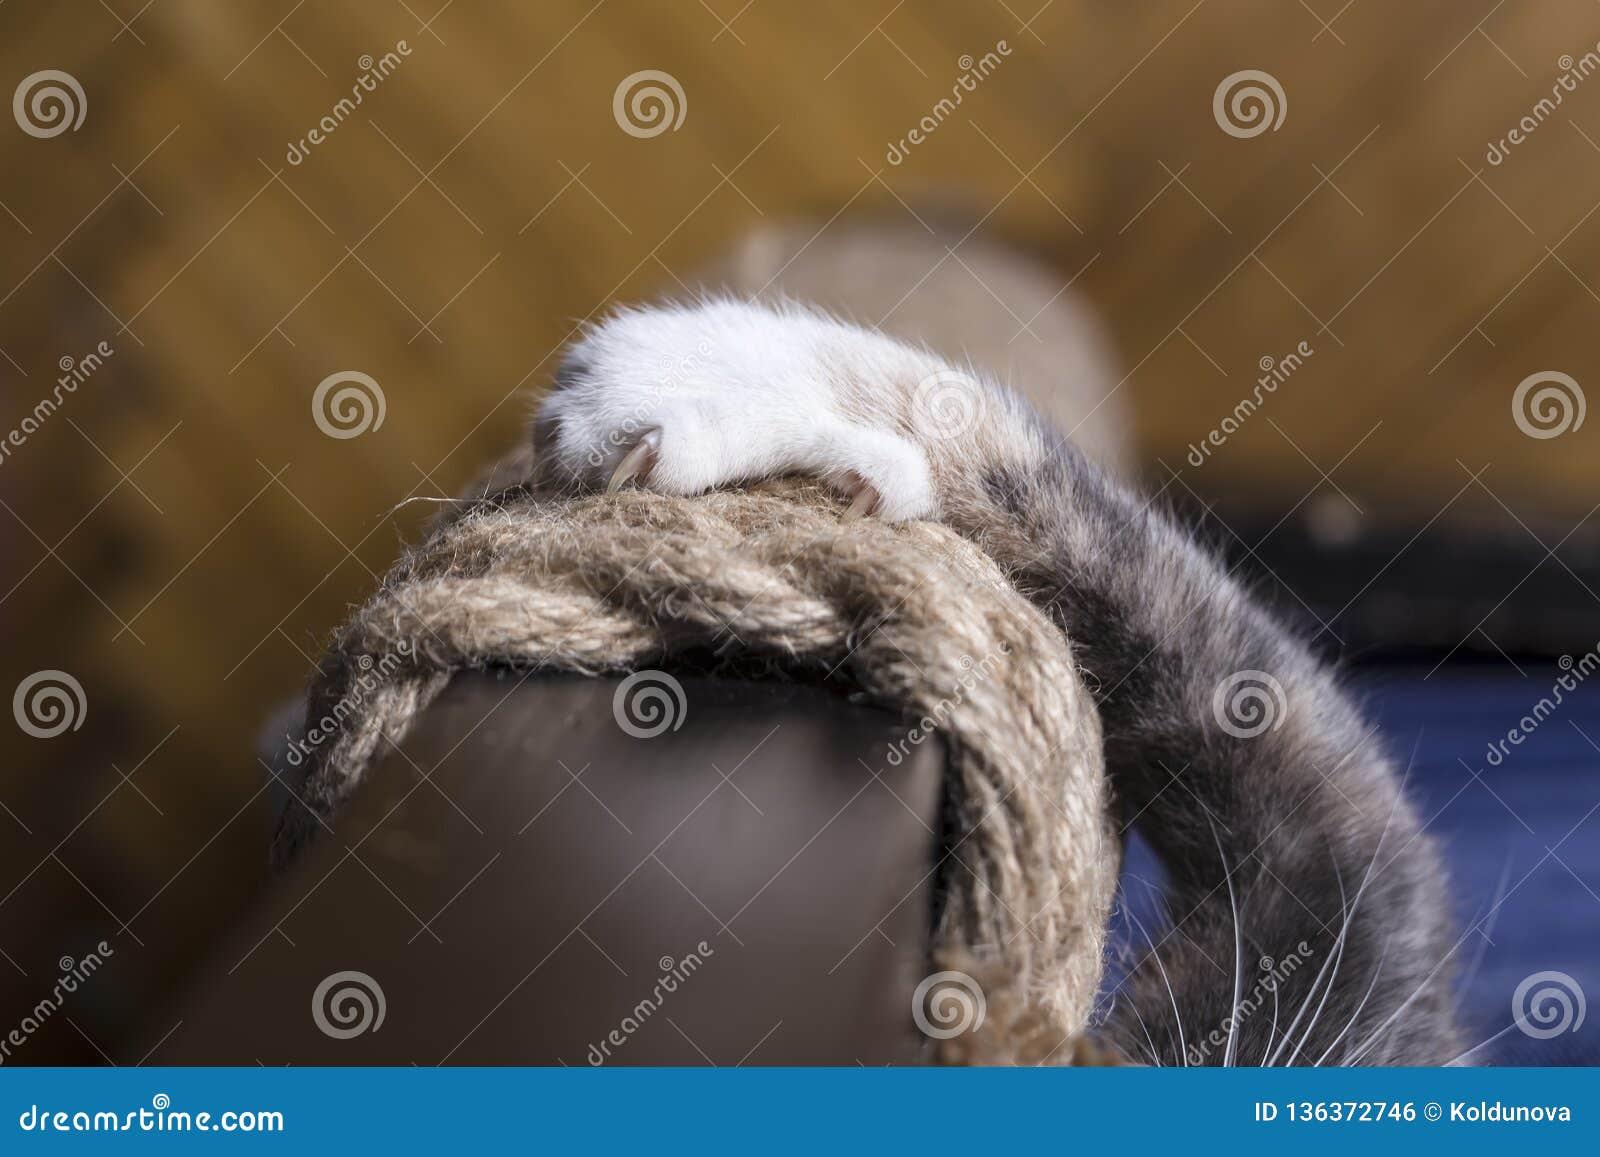 Kot łapa z ostrzem drapa na arkanie